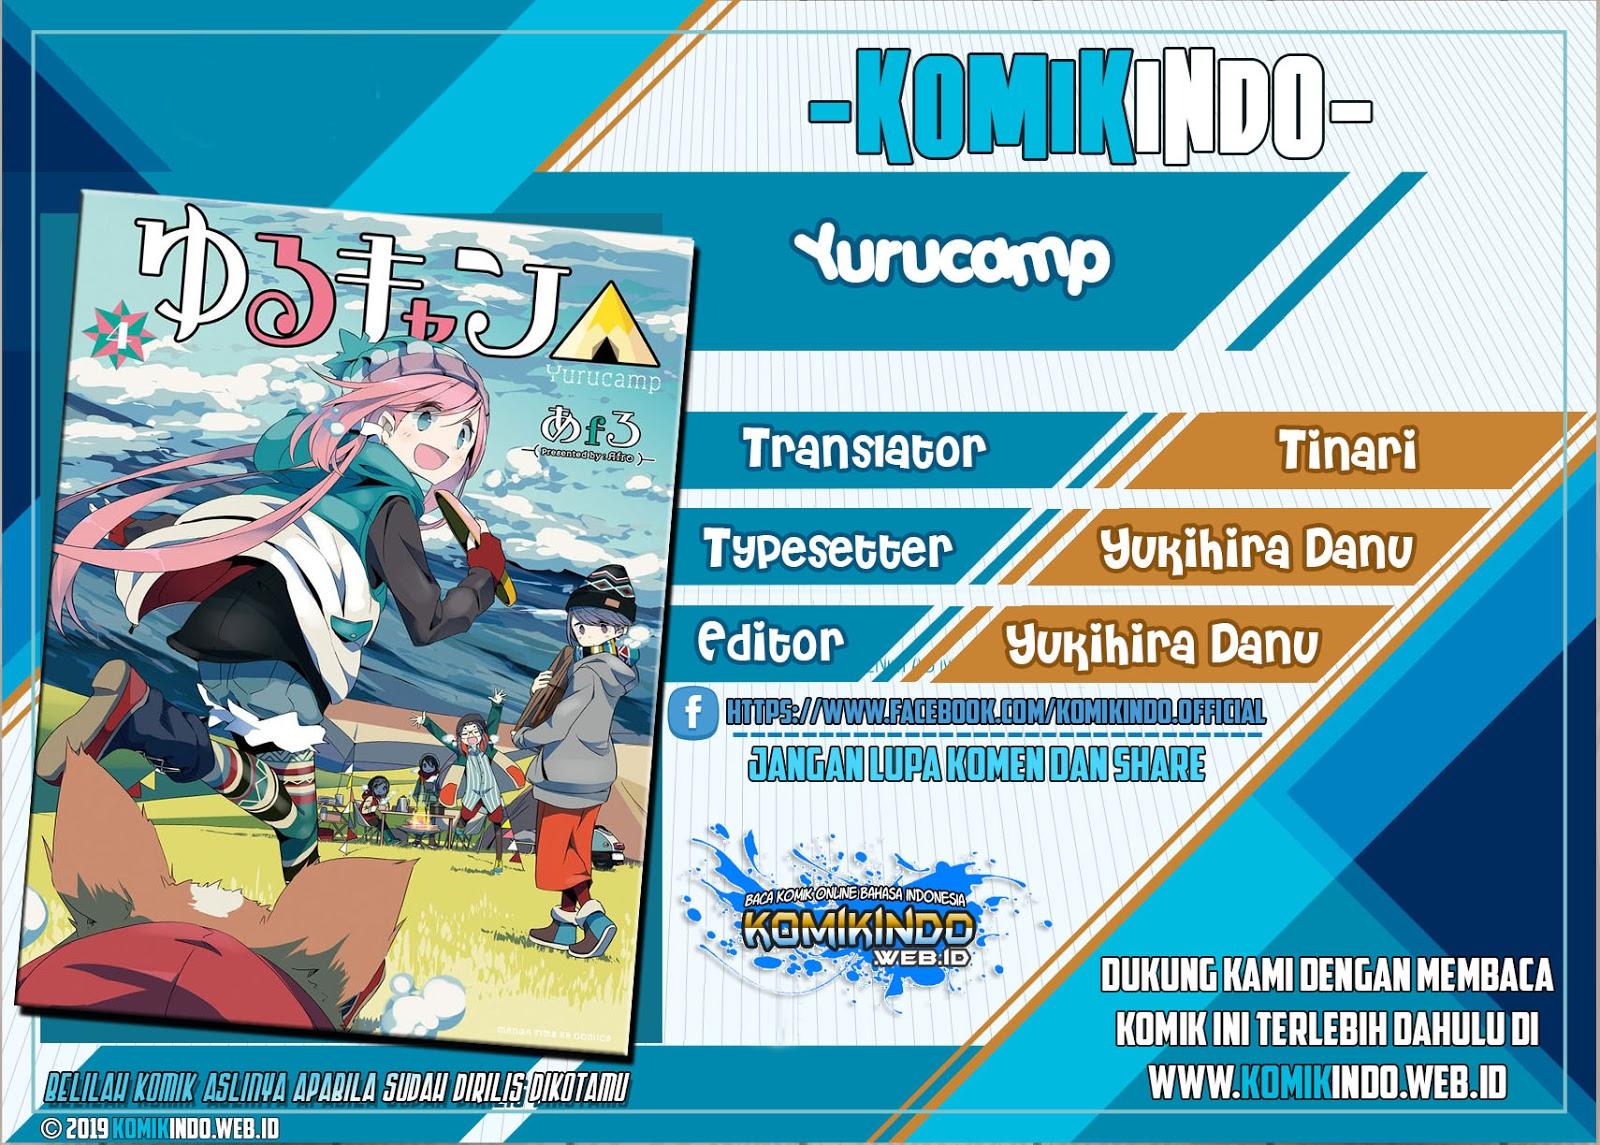 Dilarang COPAS - situs resmi www.mangacanblog.com - Komik yuru camp 016 - chapter 16 17 Indonesia yuru camp 016 - chapter 16 Terbaru  Baca Manga Komik Indonesia Mangacan